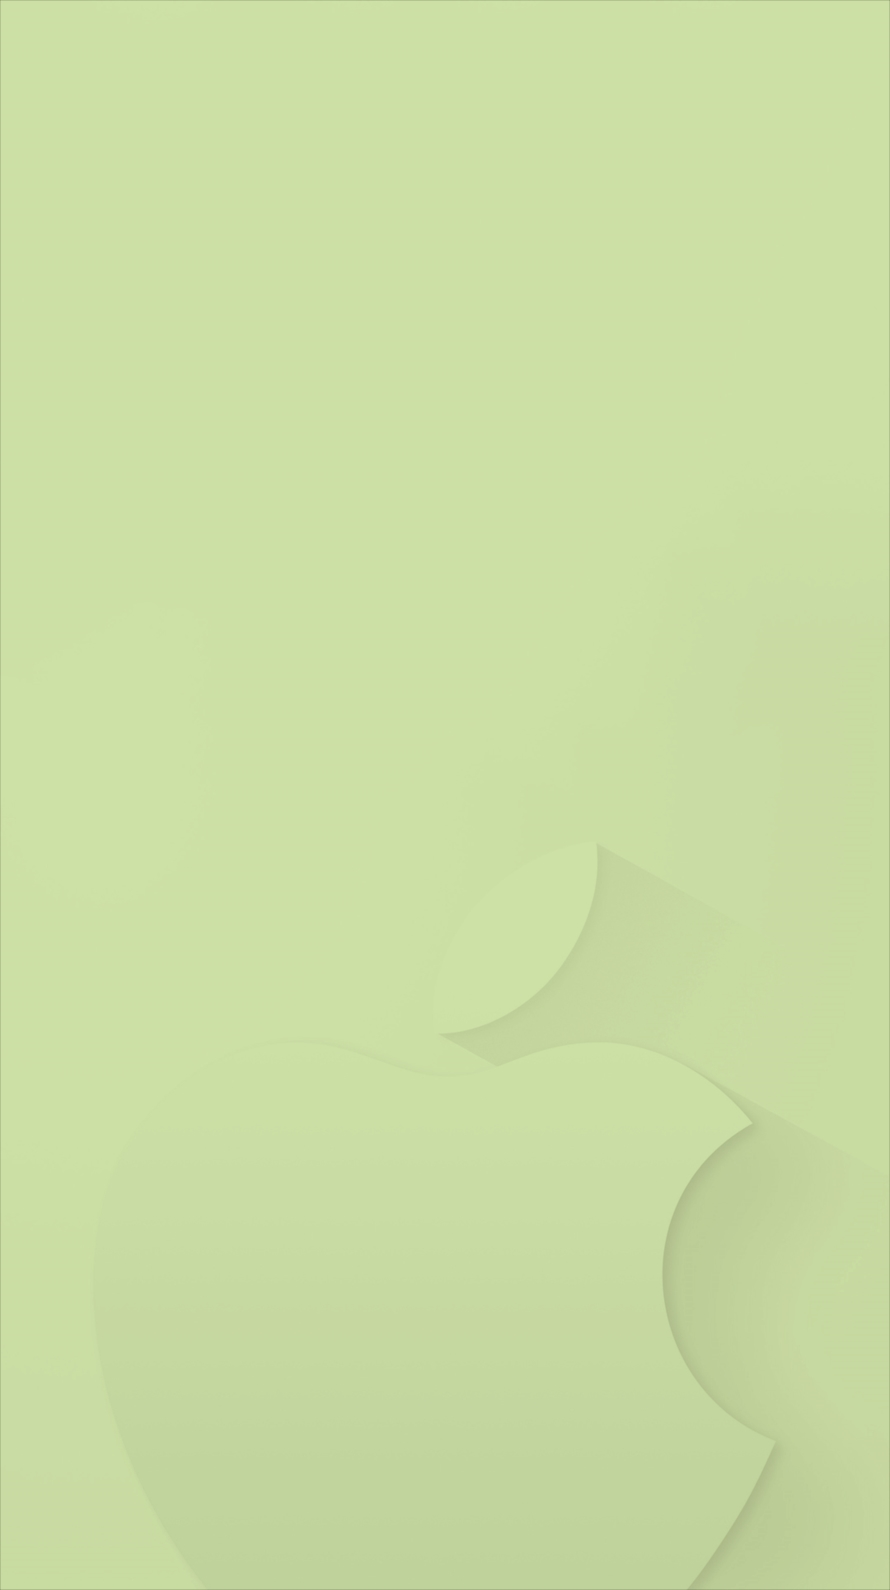 flat green apple logo iPhone6壁紙